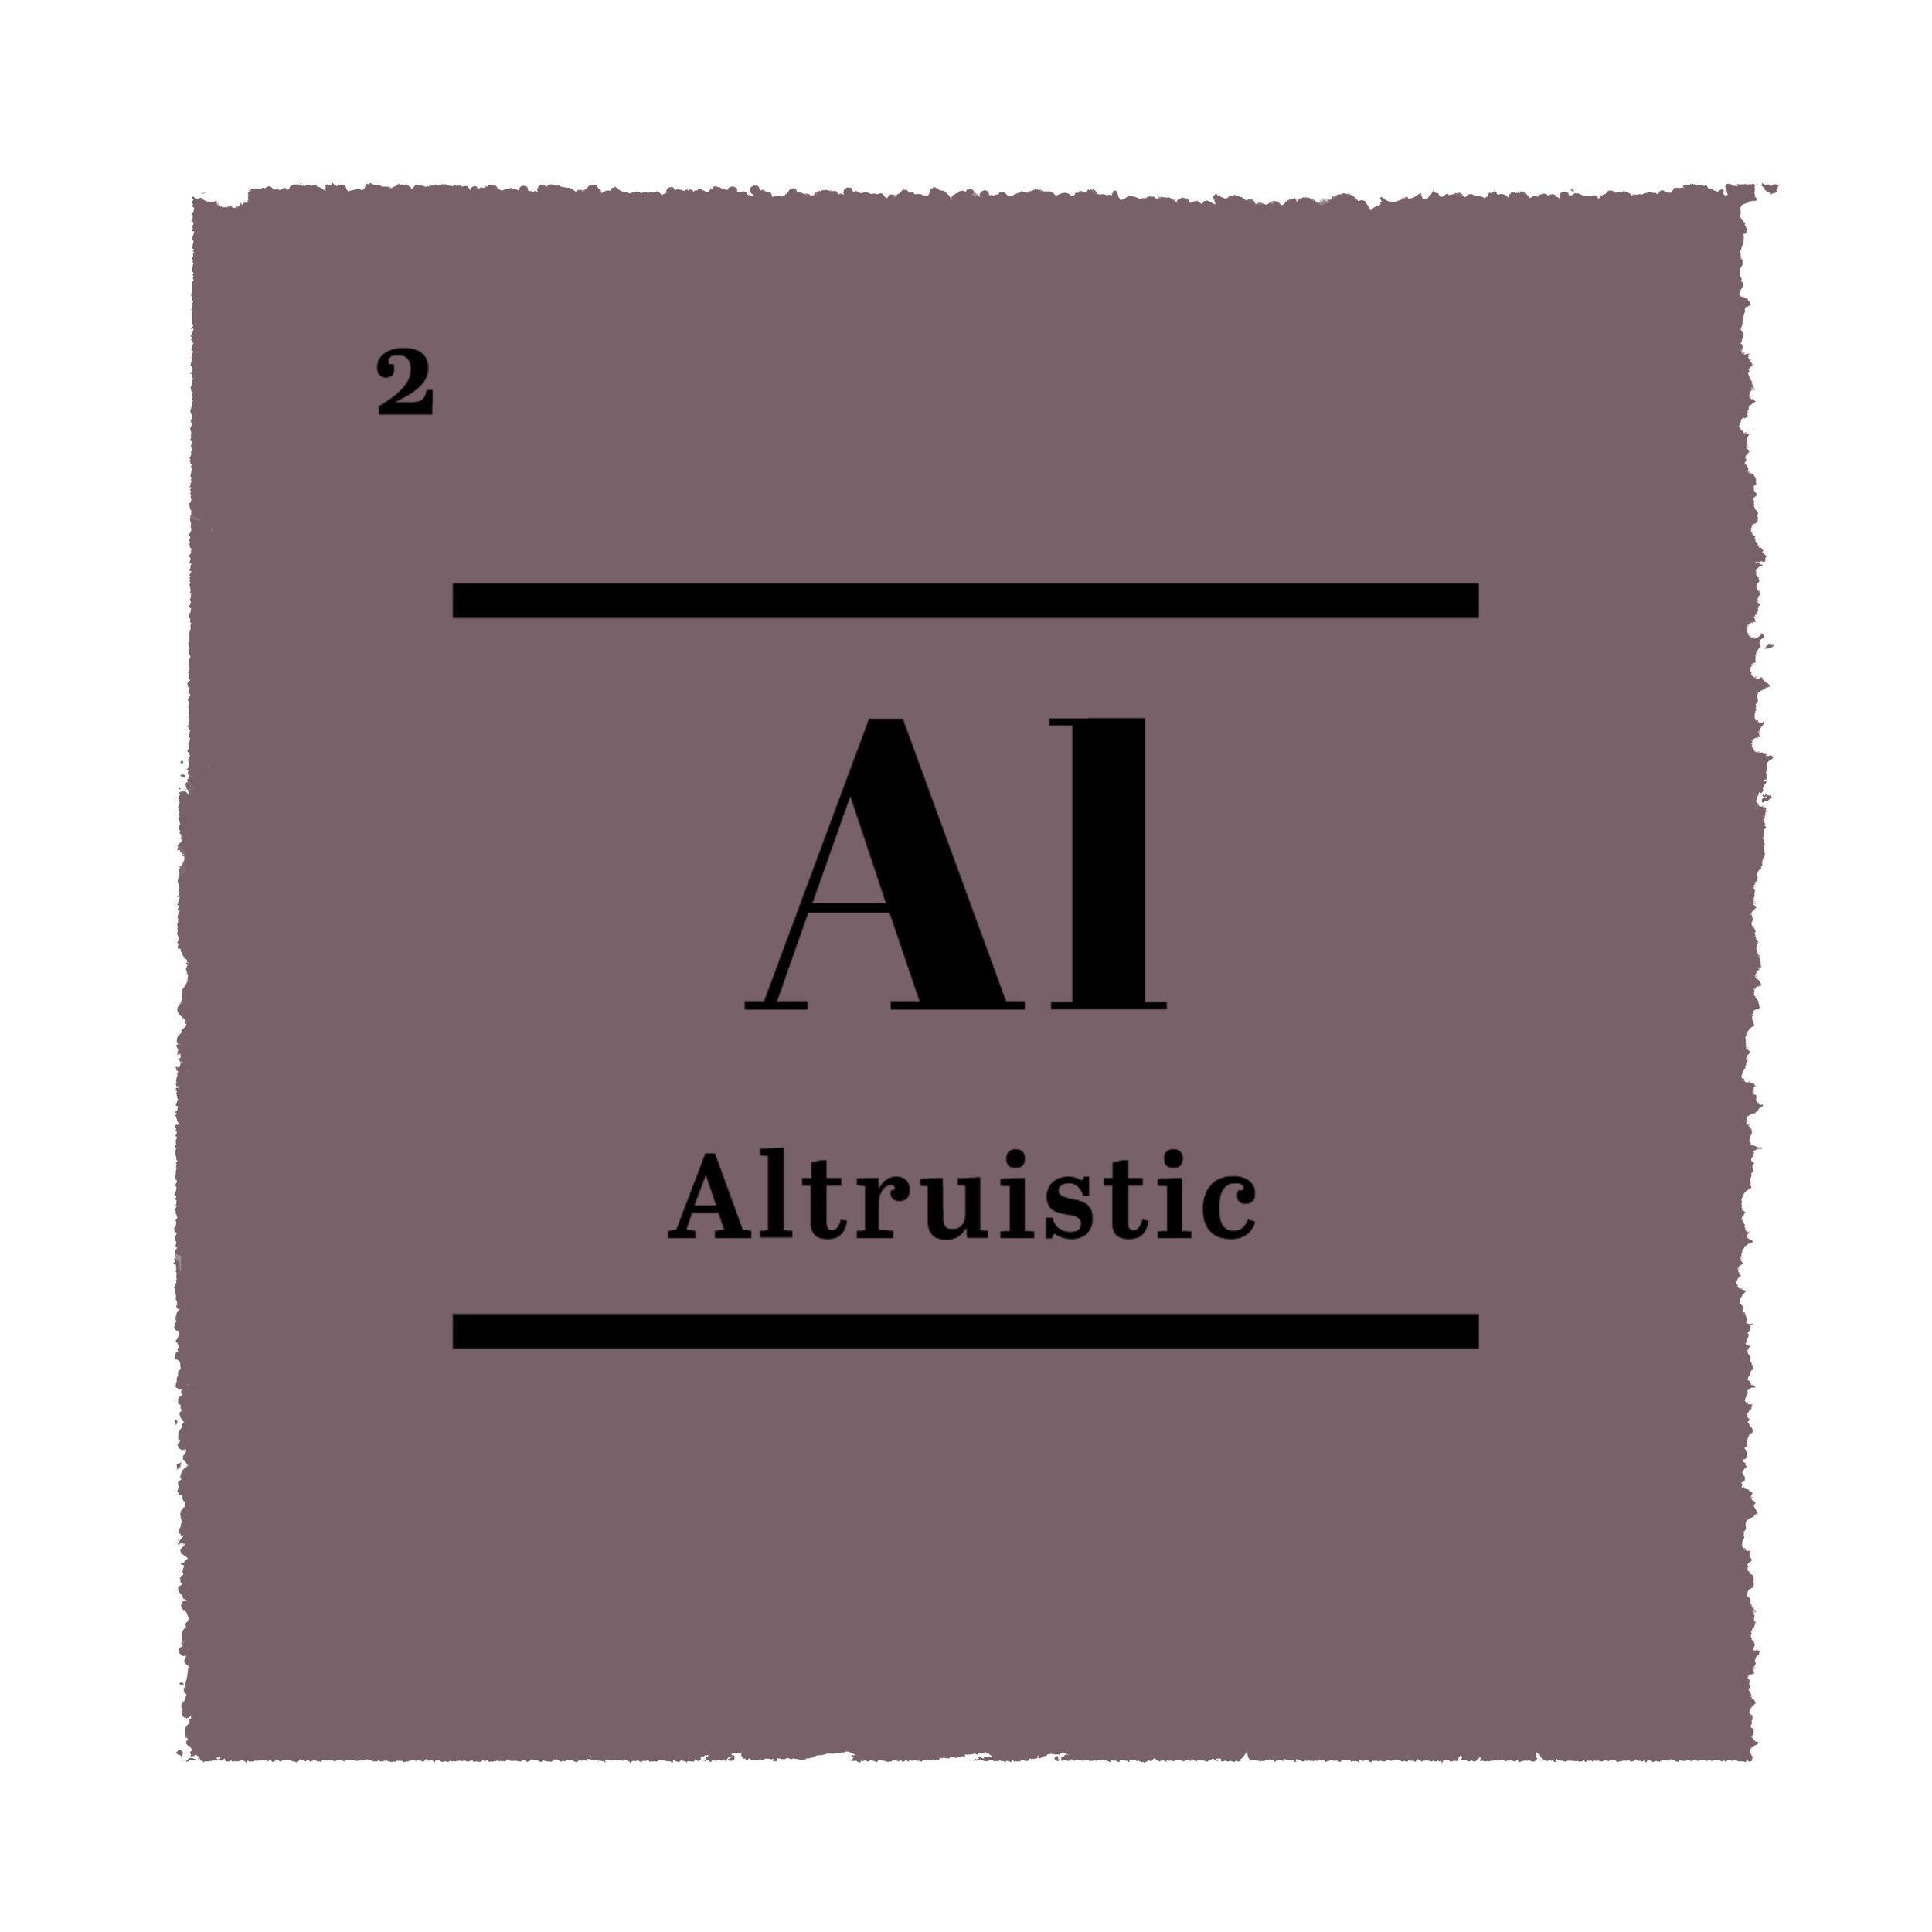 Altruistic